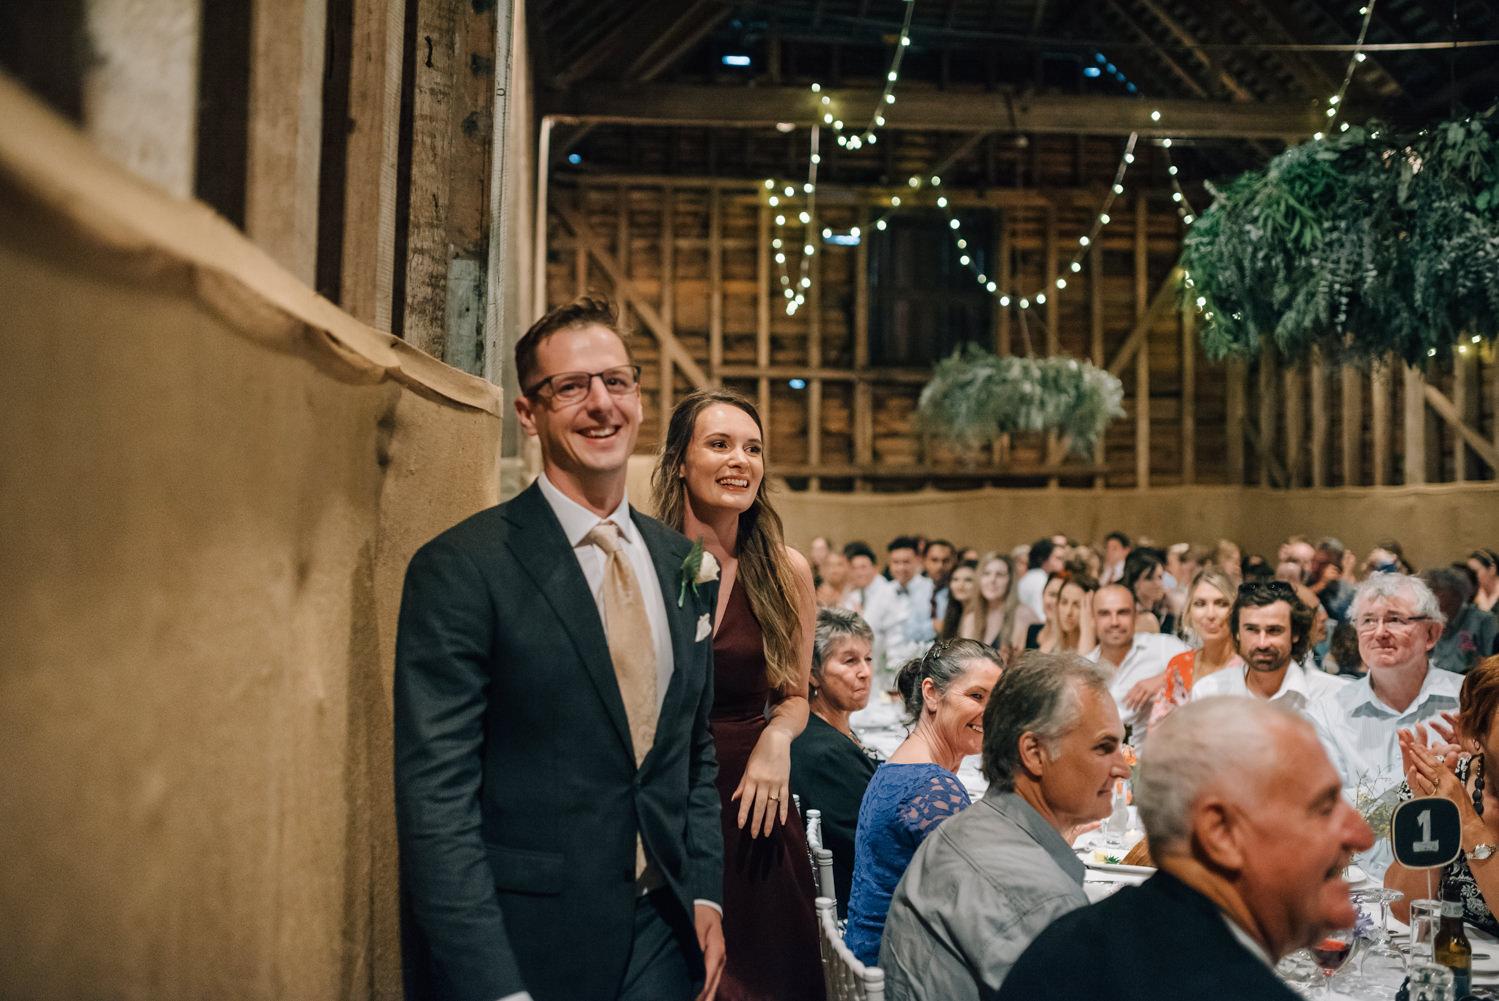 Brickendon-Wedding-Photographer-126.jpg